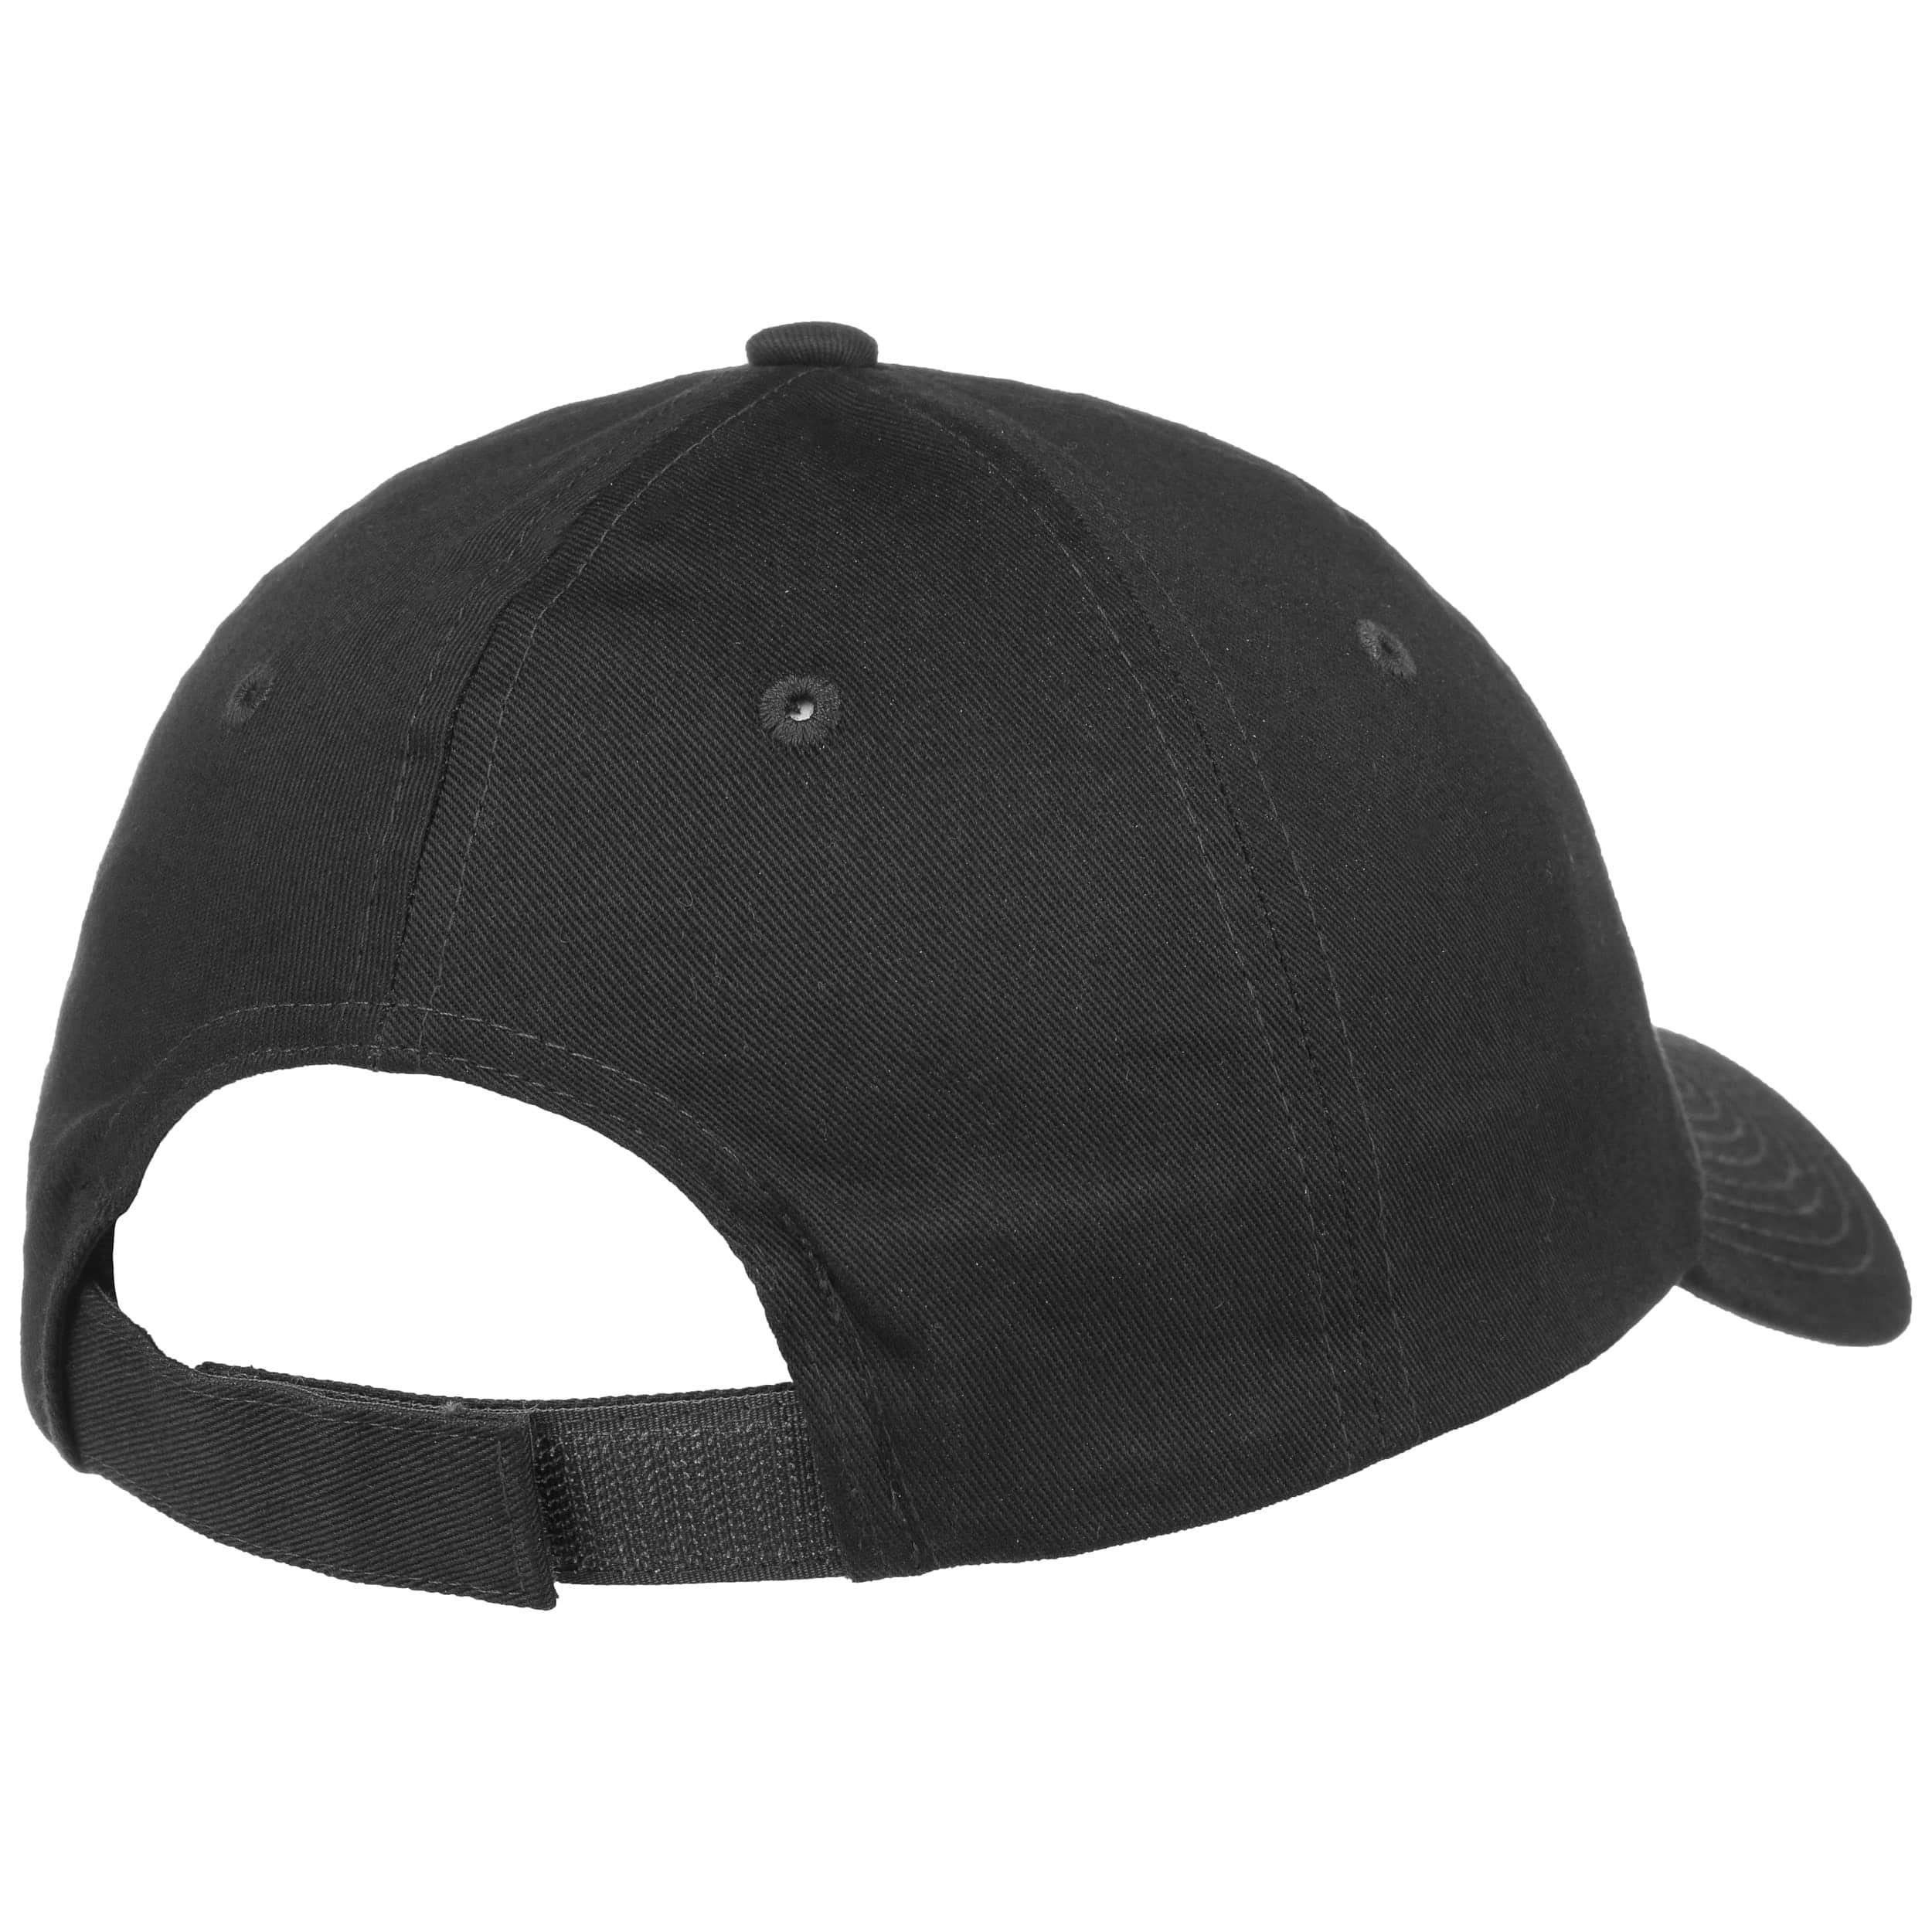 ... Big Cat Ess Junior Cap by PUMA - black 3 ... 8b3e03ebd72